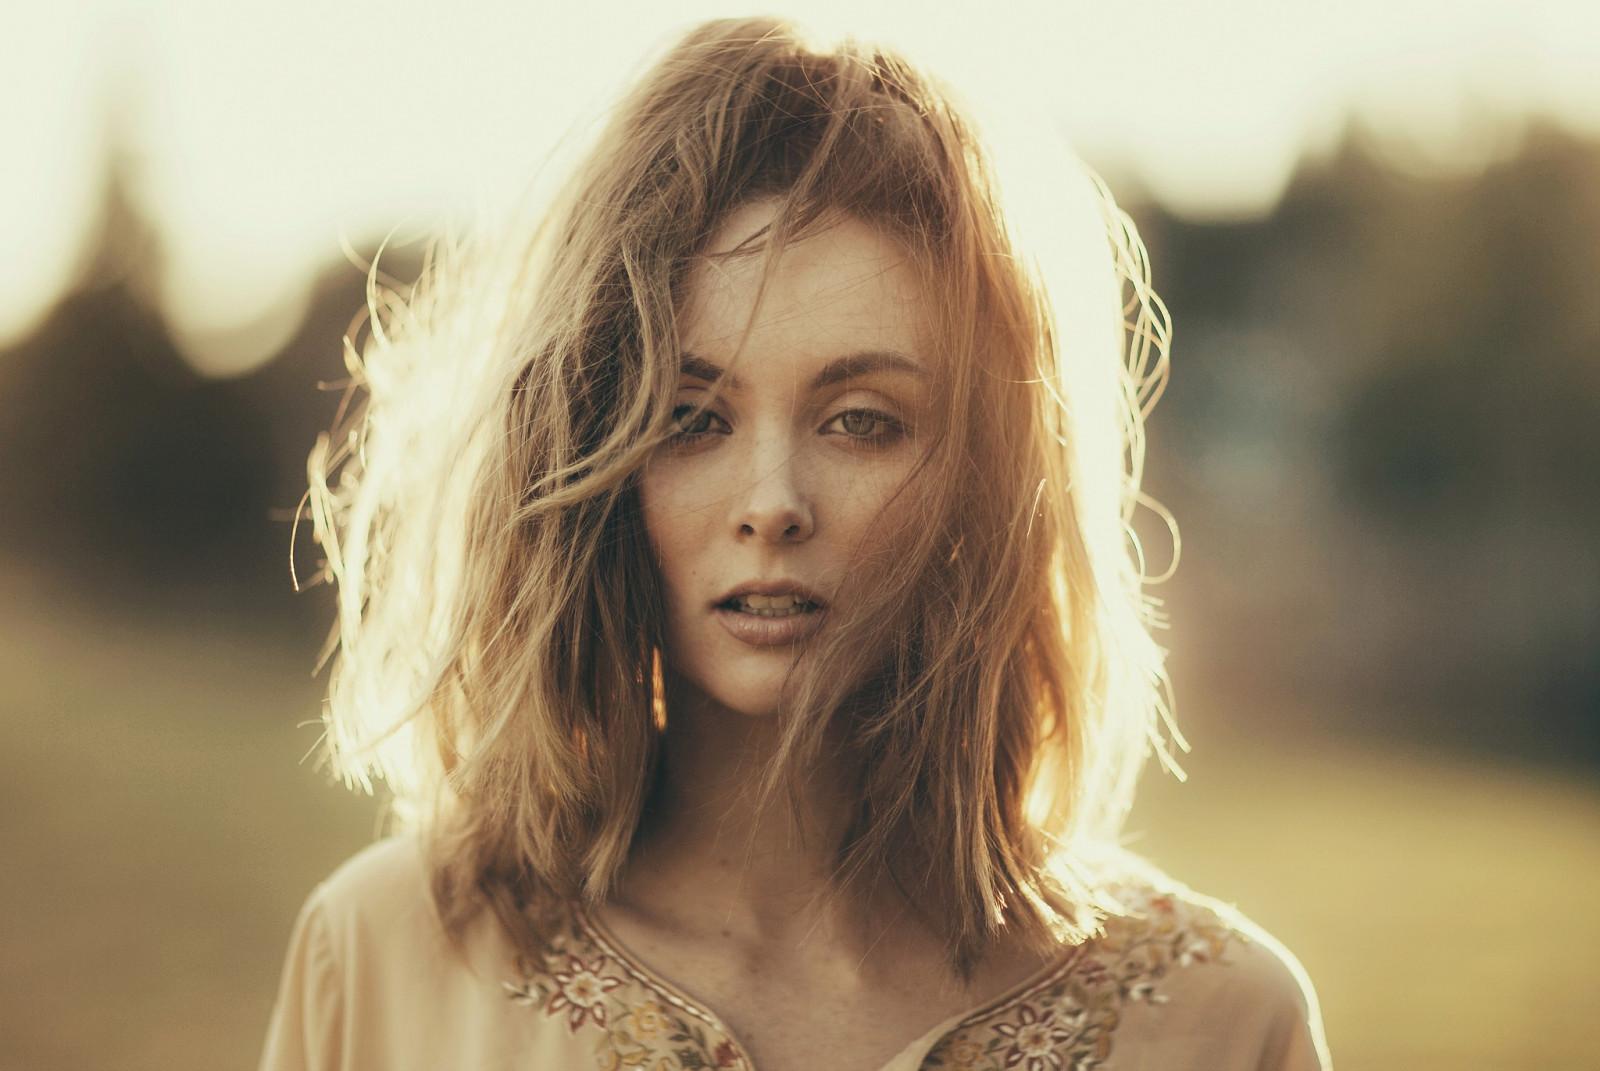 Wallpaper : face, women, model, long hair, blue eyes